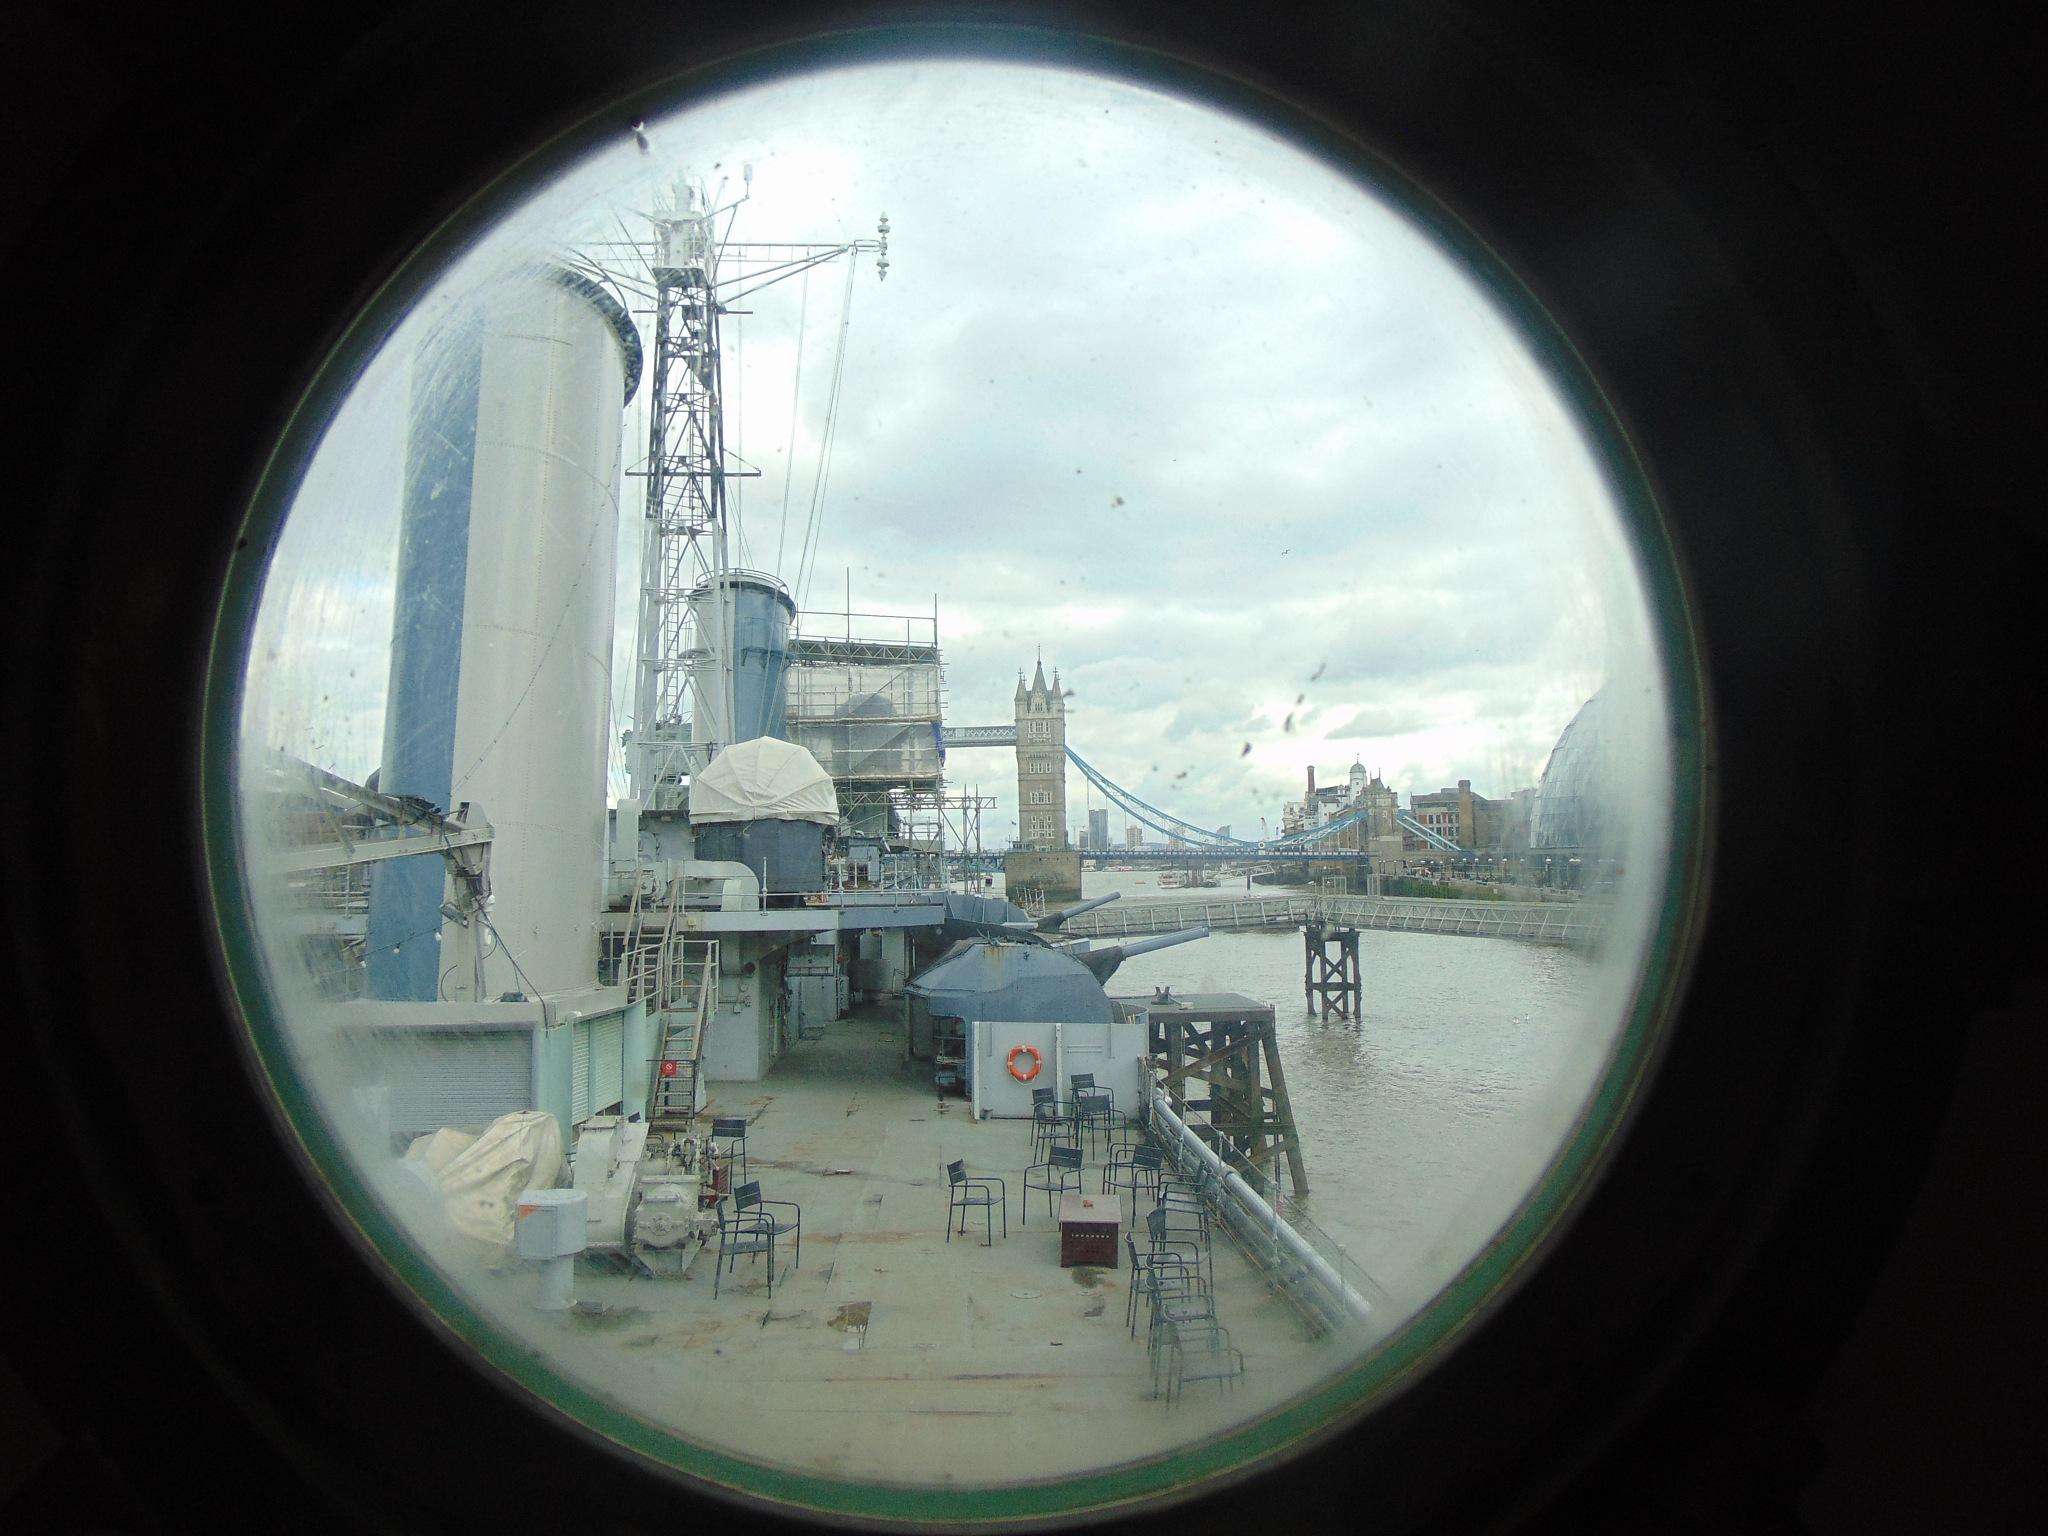 Looking through a porthole by brian.f.kirkham